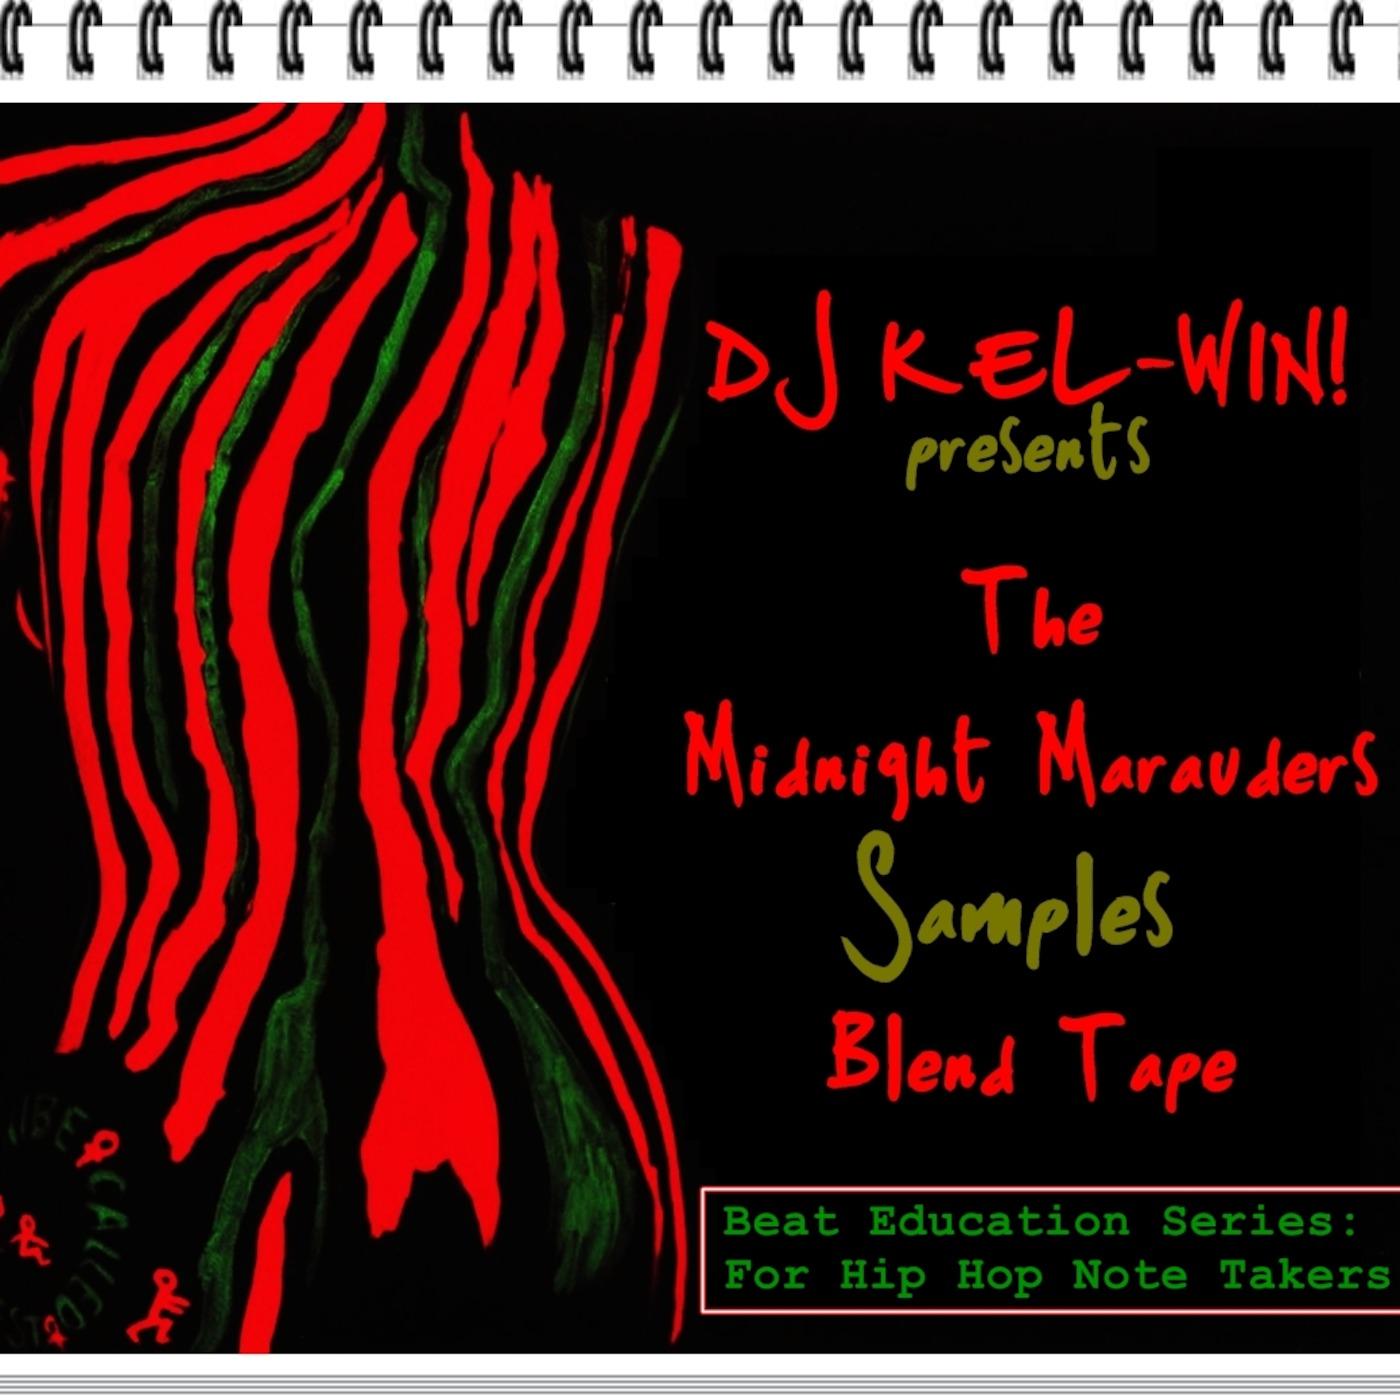 DJ KEL-WIN! Midnight Marauders: The Samples Mixtape (Beat